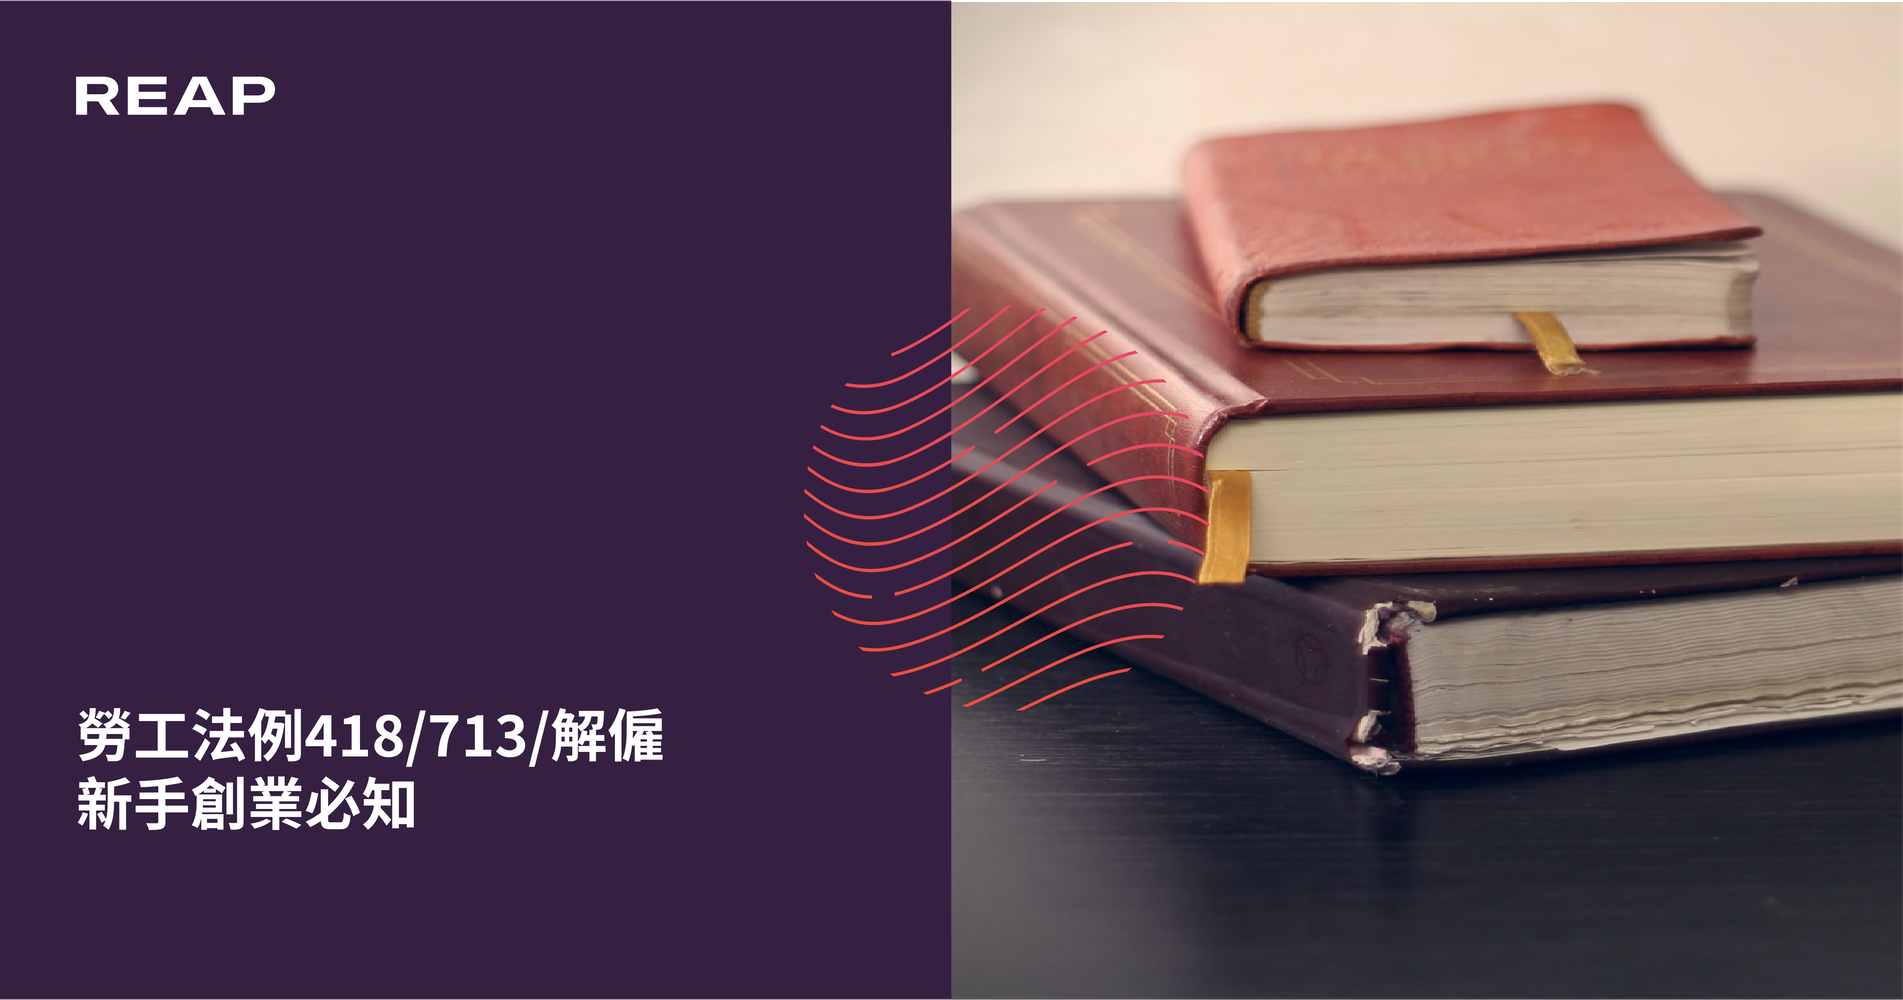 Cover Image for 勞工法例418/713/解僱 新手創業必知